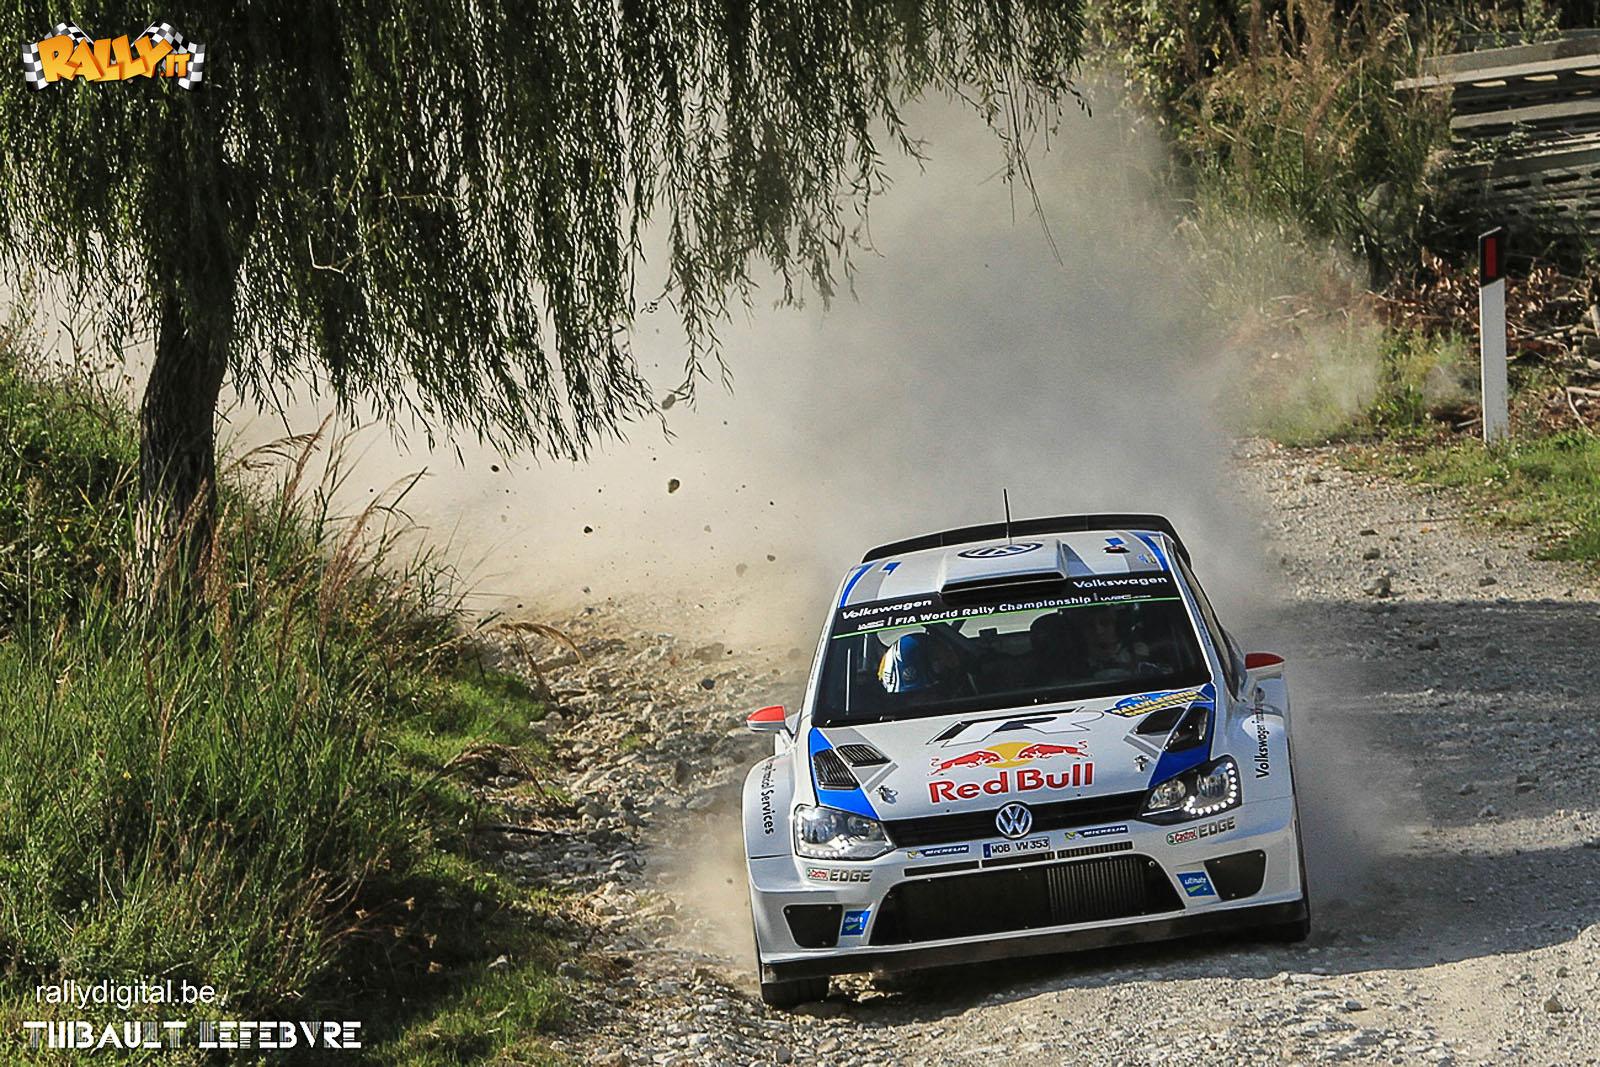 030-RallyLegend-2014.jpg